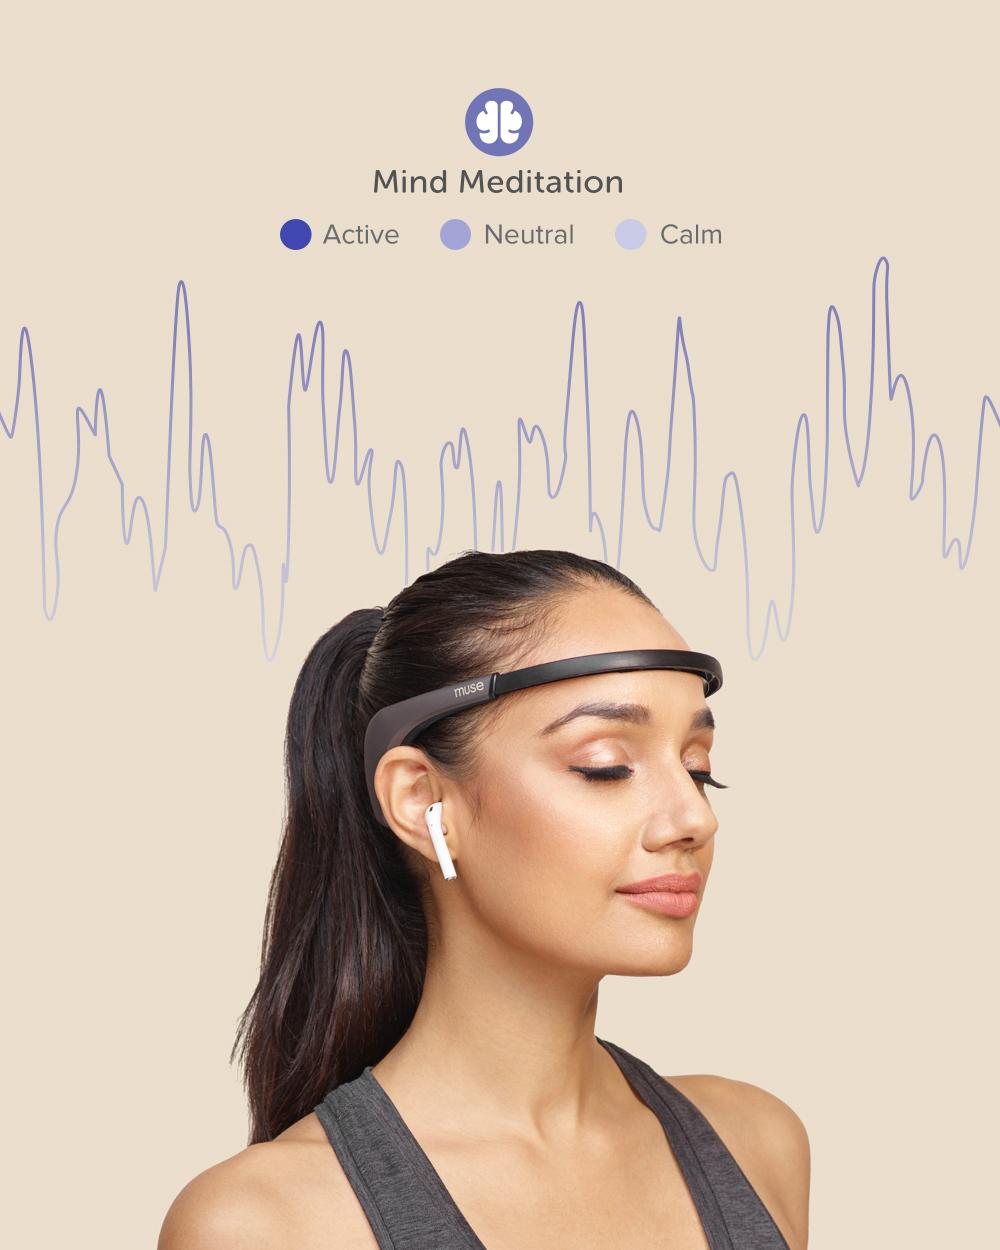 Muse 2 - Brain and Body Sensing Headband. Save 15% at Vital Mind Body.